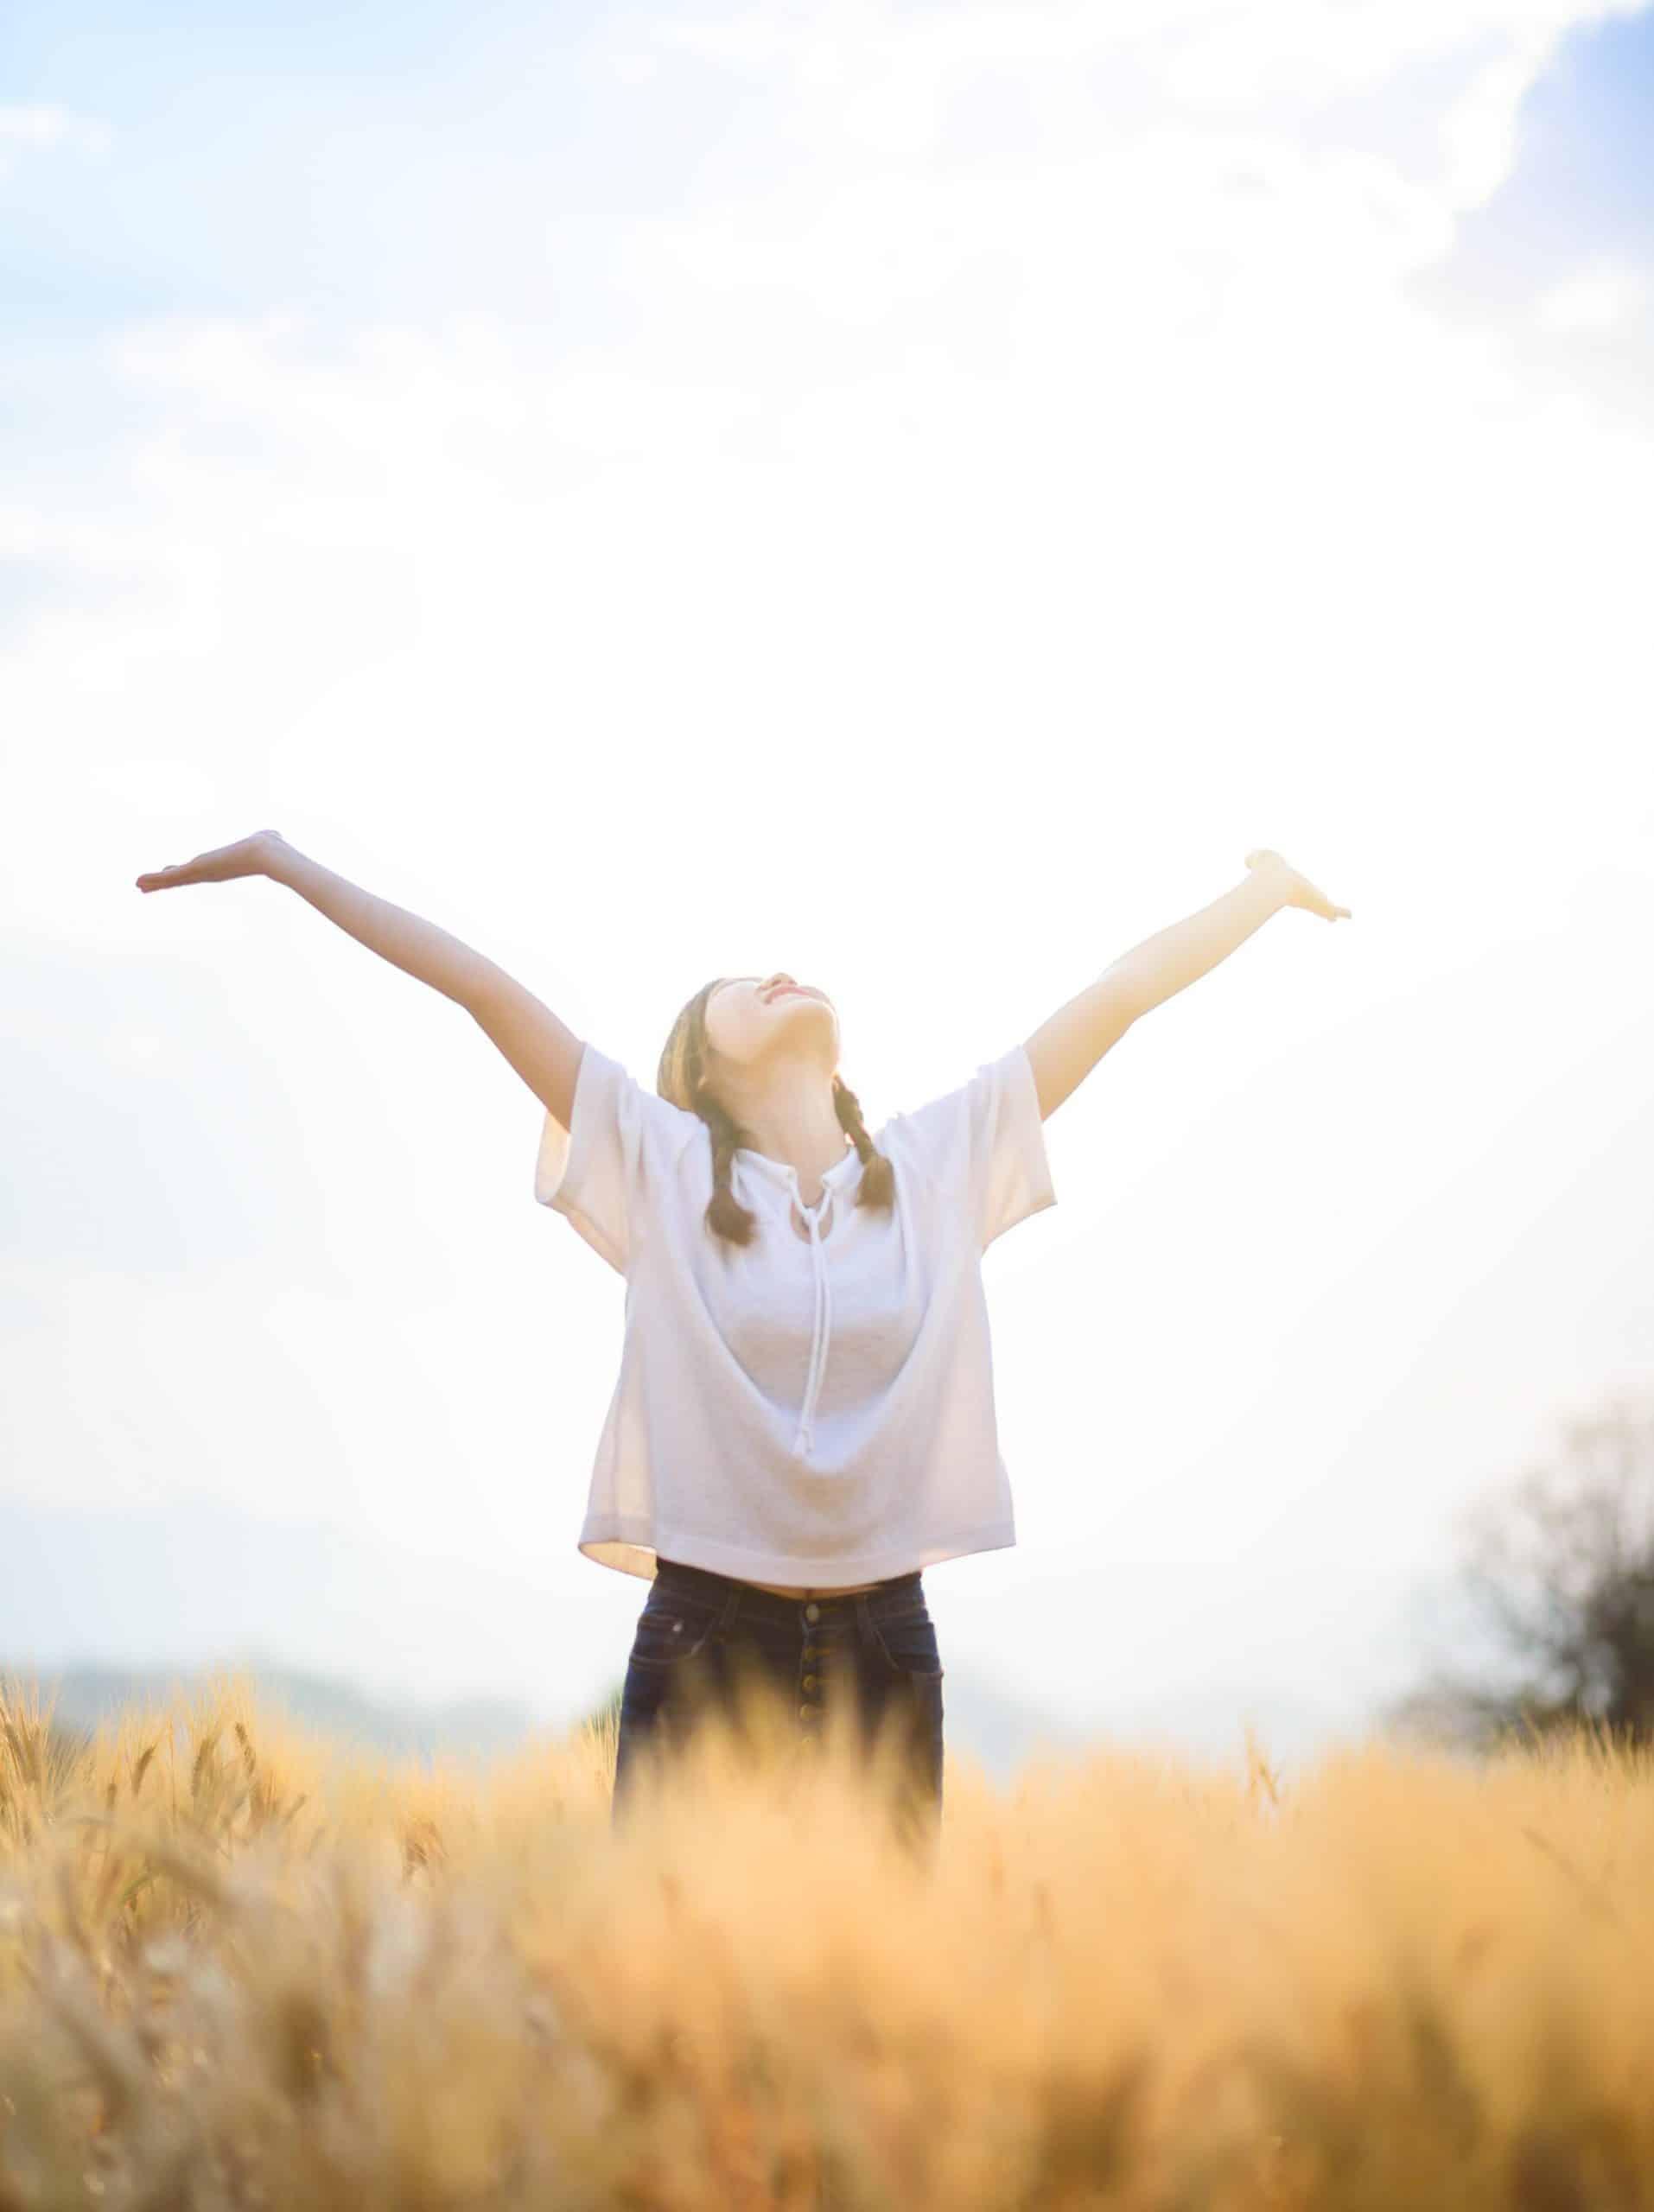 Innate-Therapies-5-benefits-of-personal-development-blog-image1